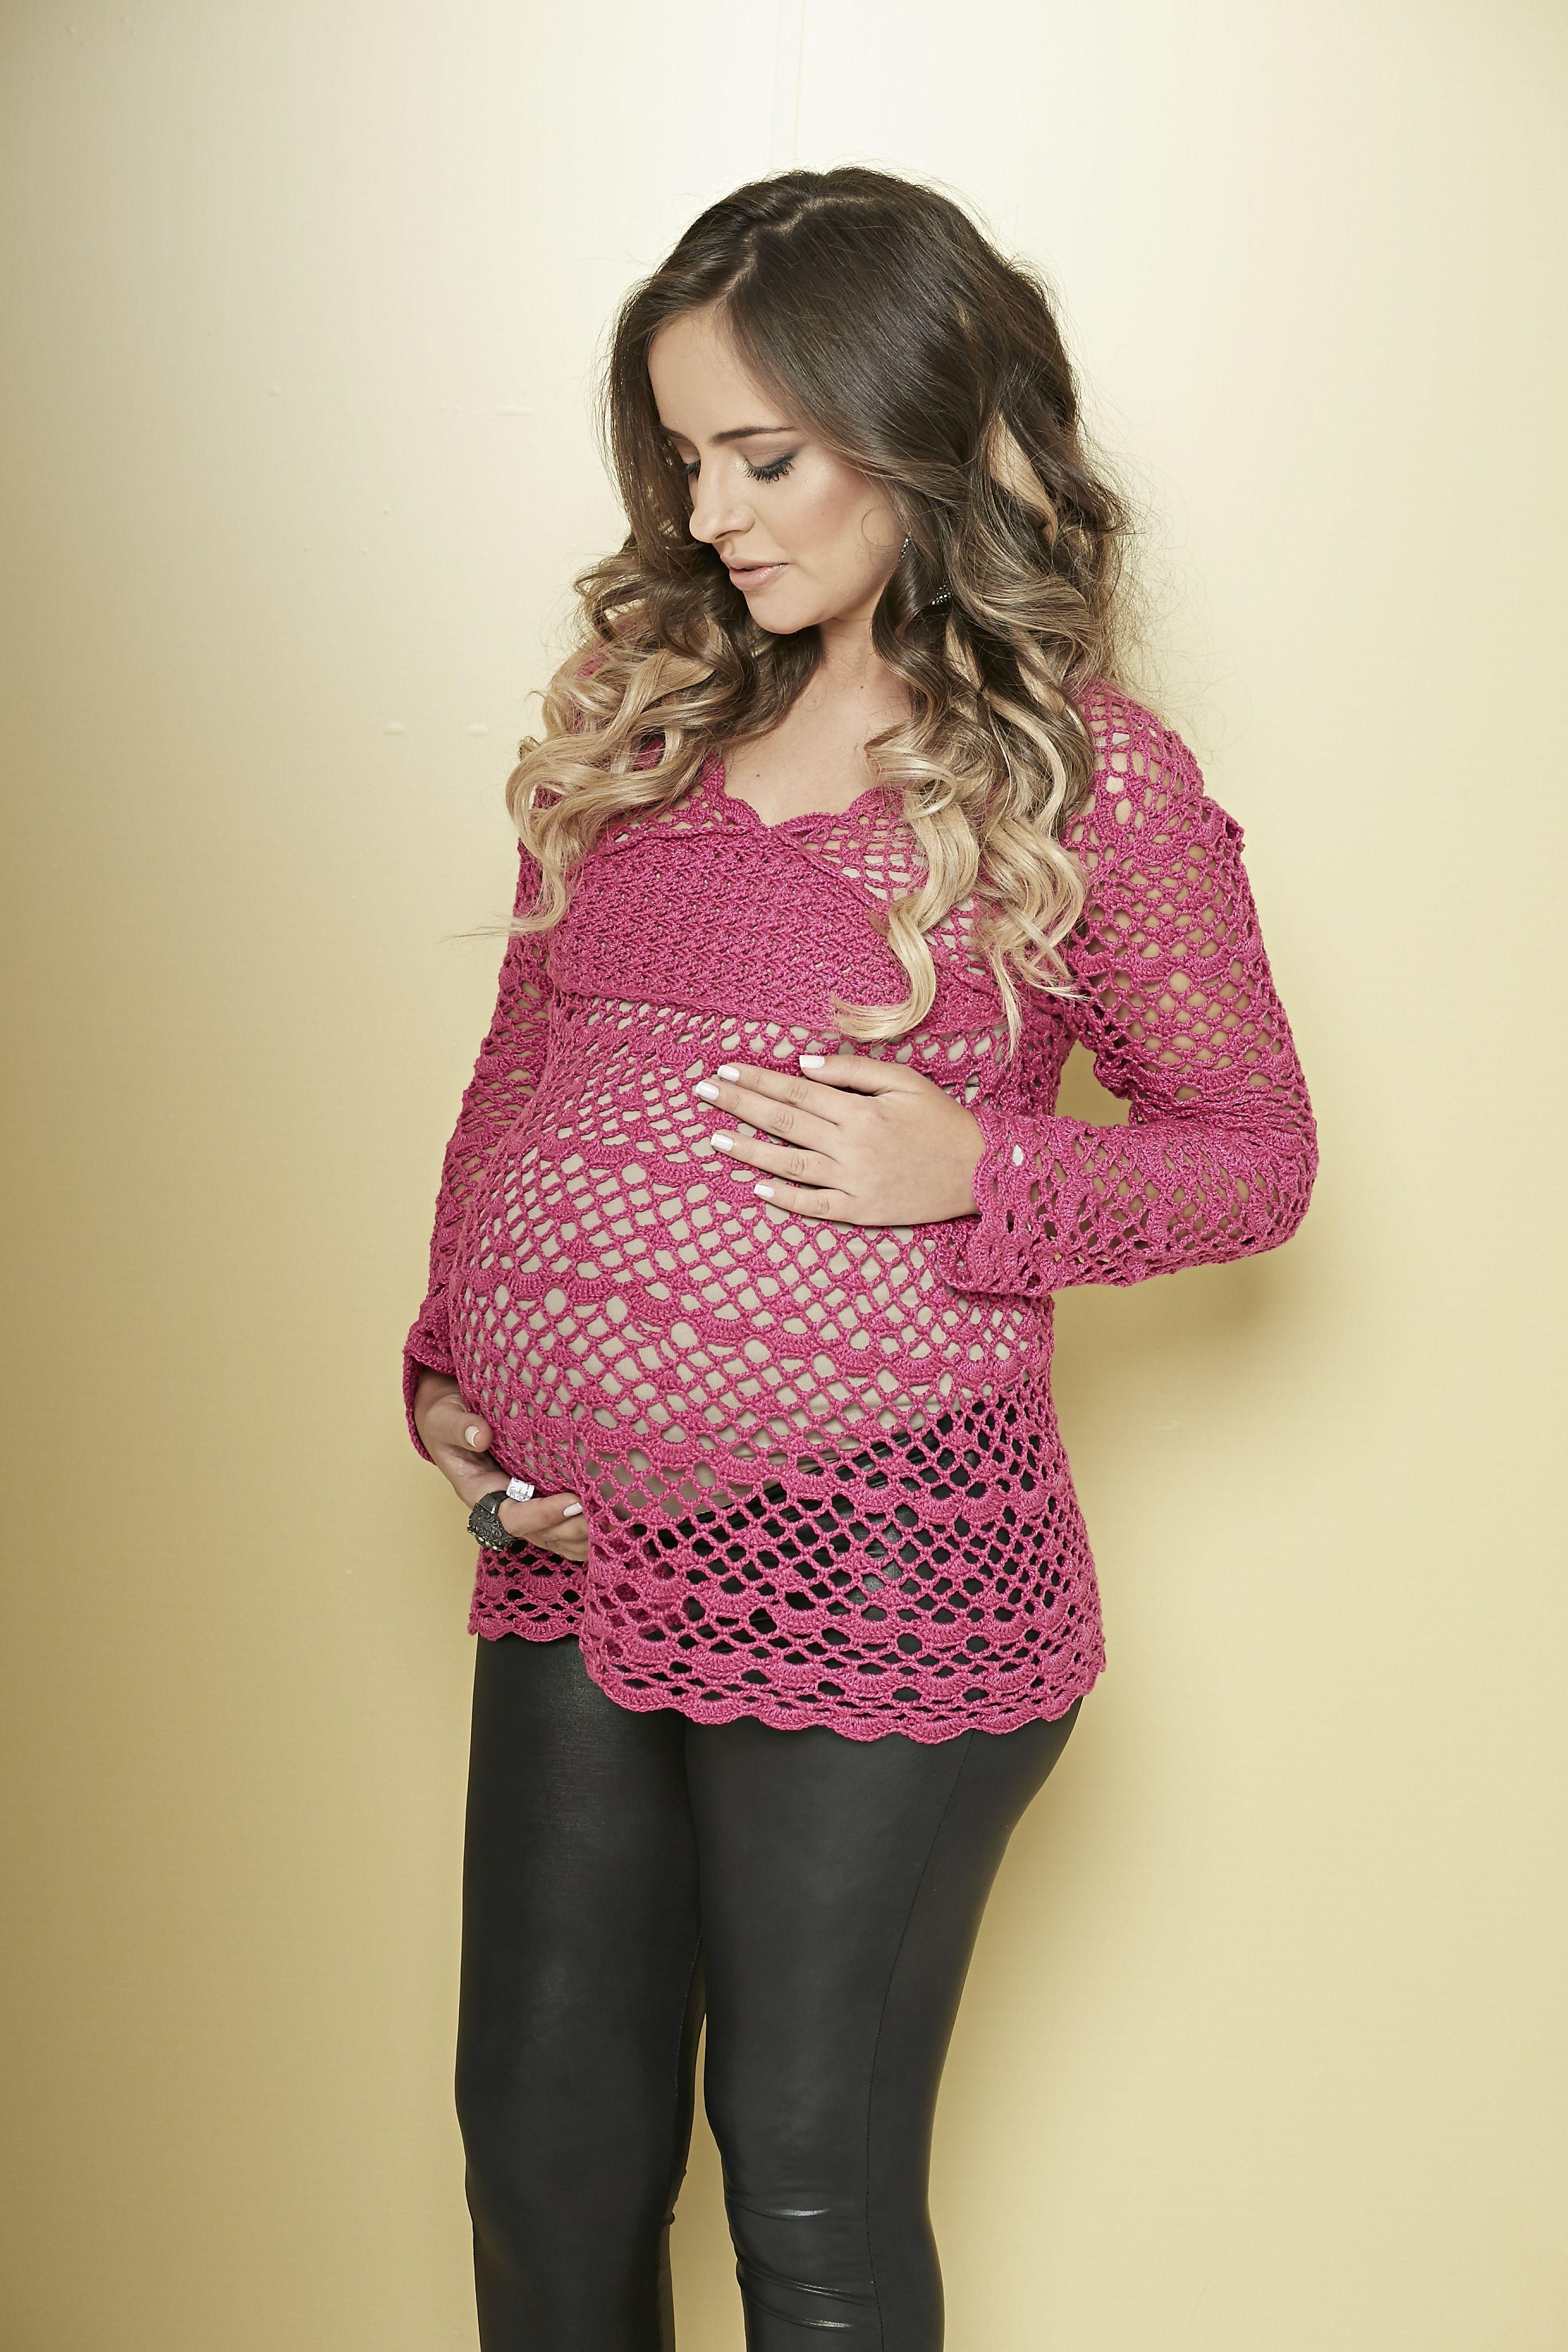 moda gestante - Pesquisa Google   vestidos embarazo   Pinterest ...